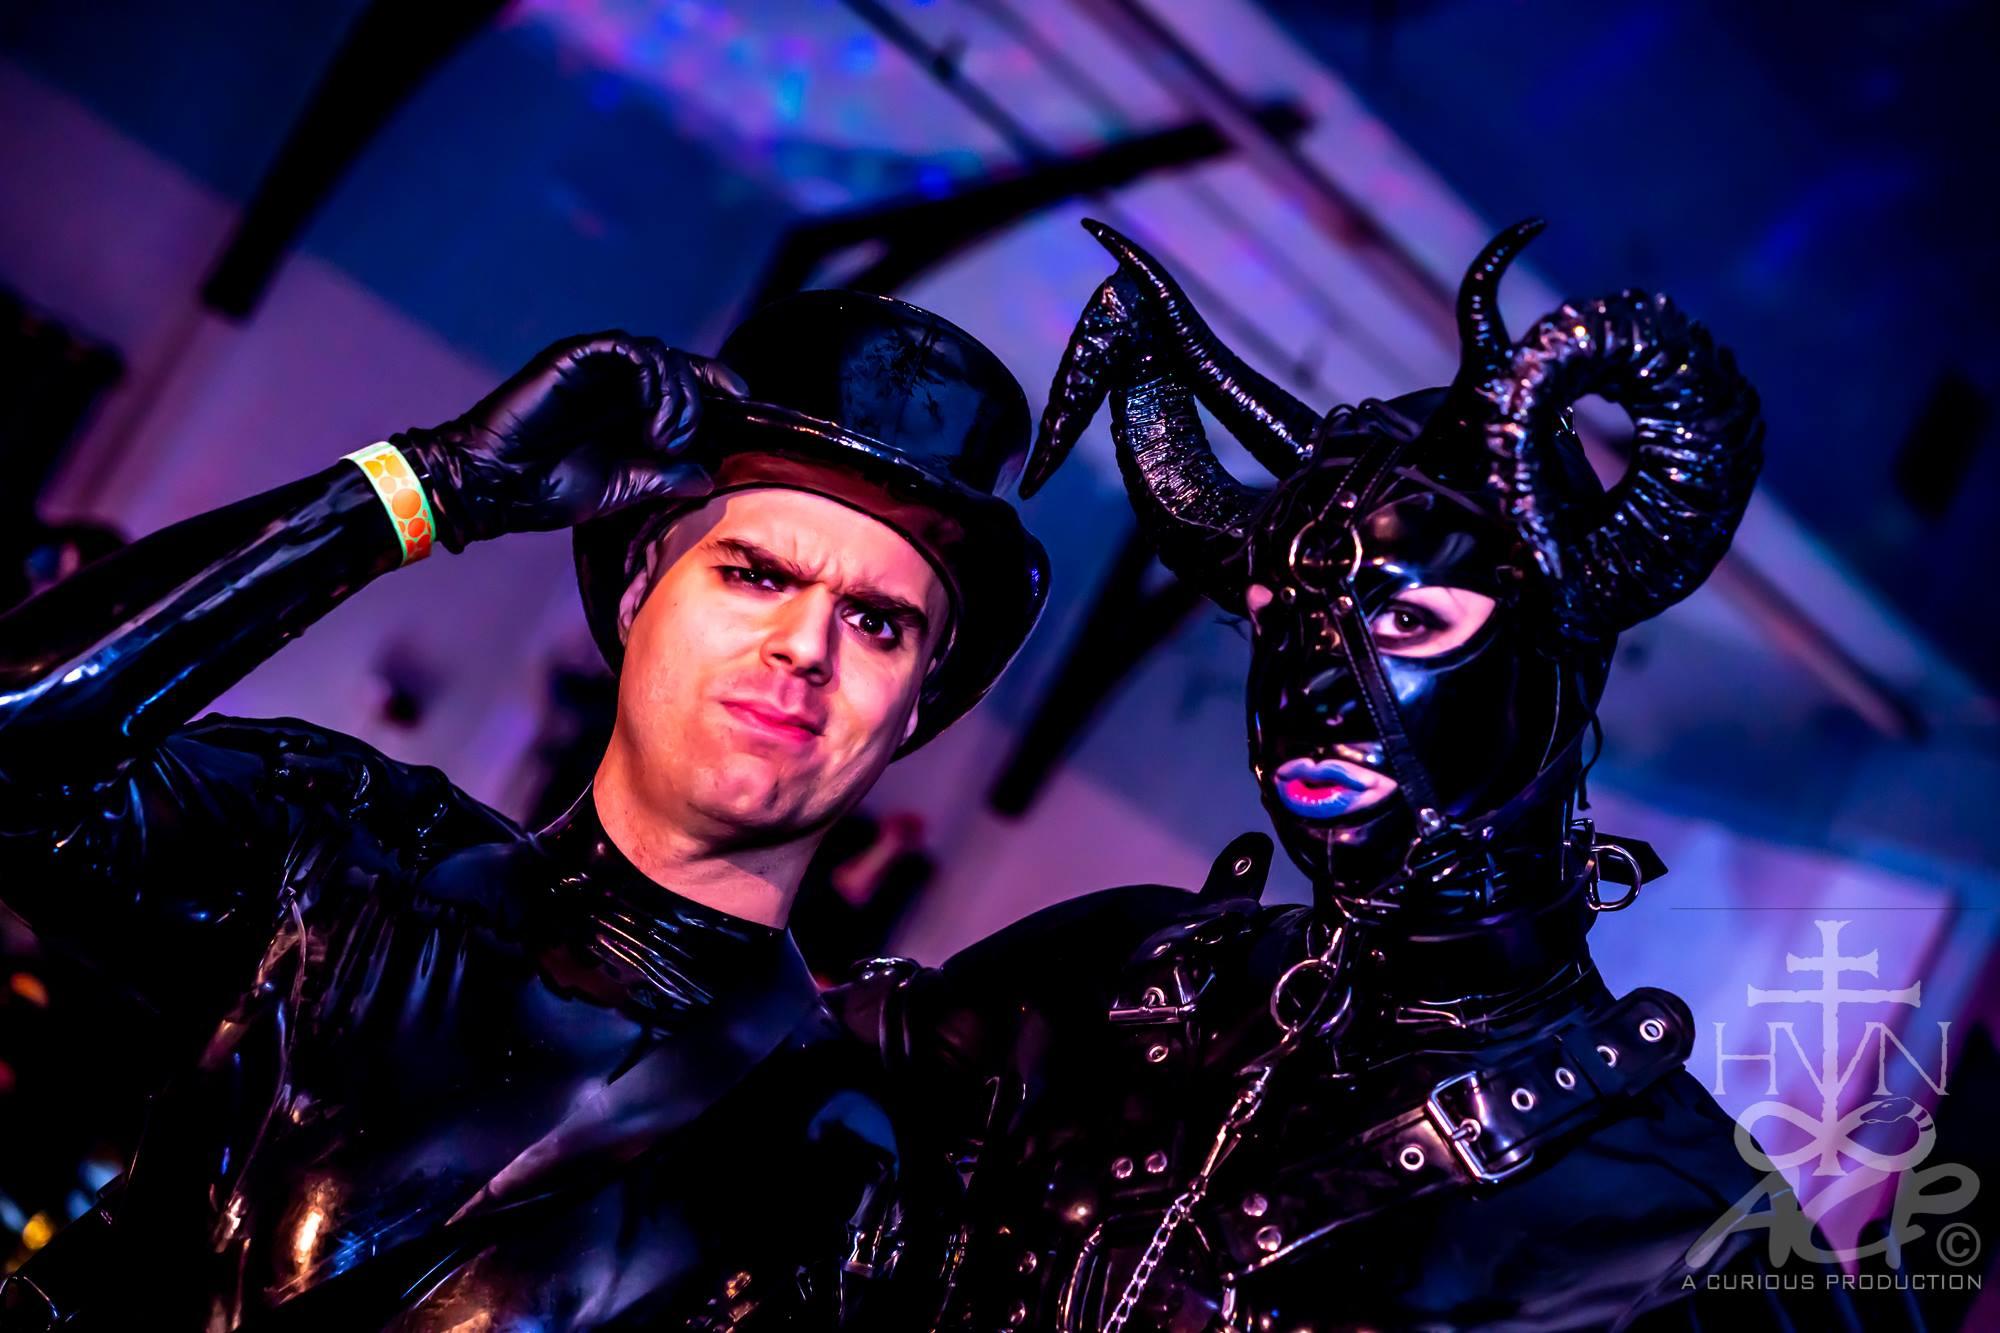 TheHavenClub-Goth-Industrial-Dance-Alternative-Northampton-MA-Exotic Erotic 2018 (50).jpg